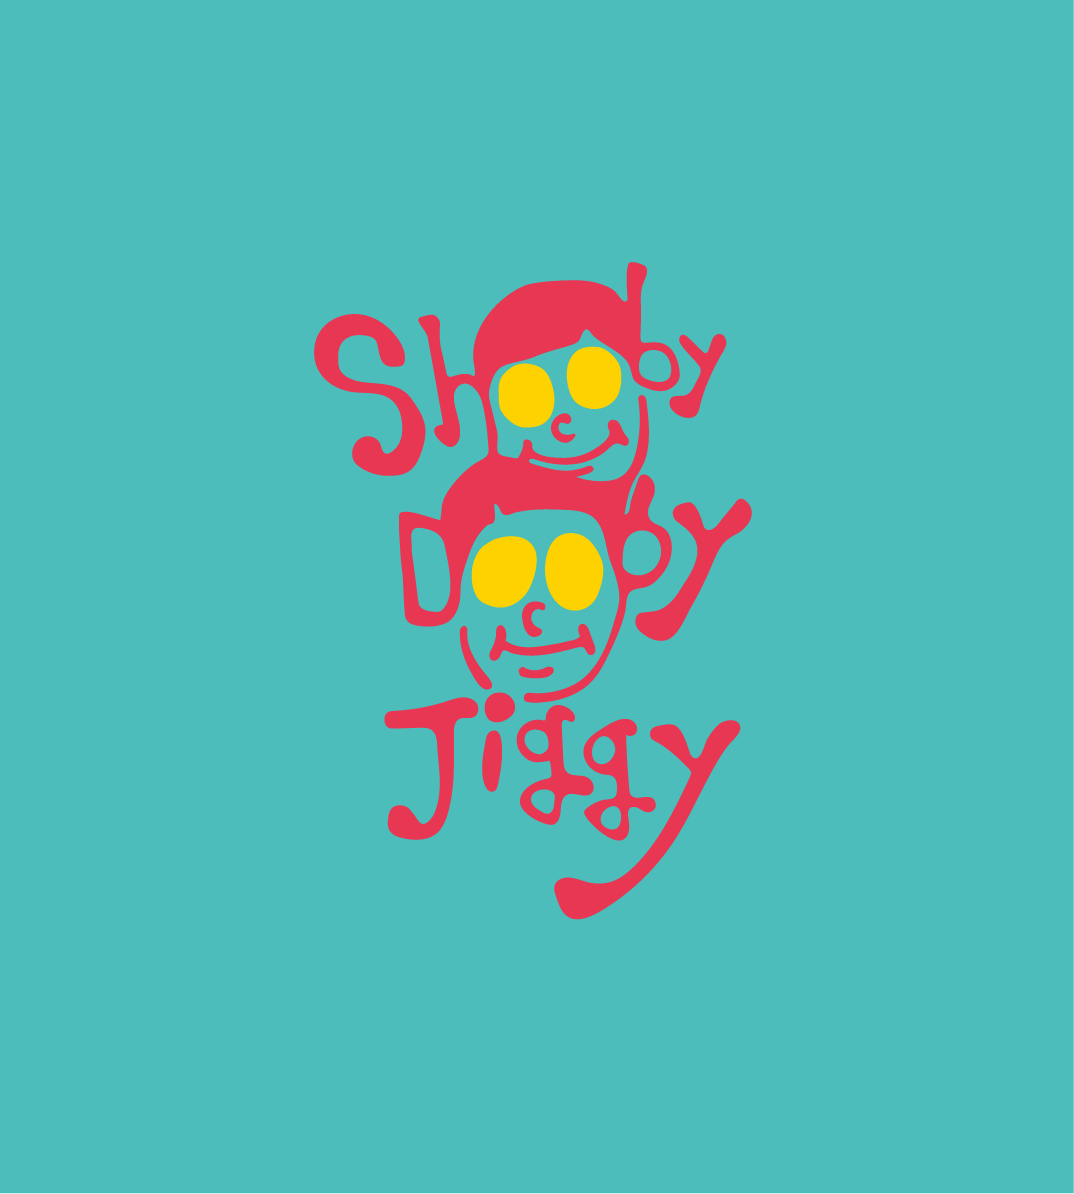 Shooby Dooby Jiggy